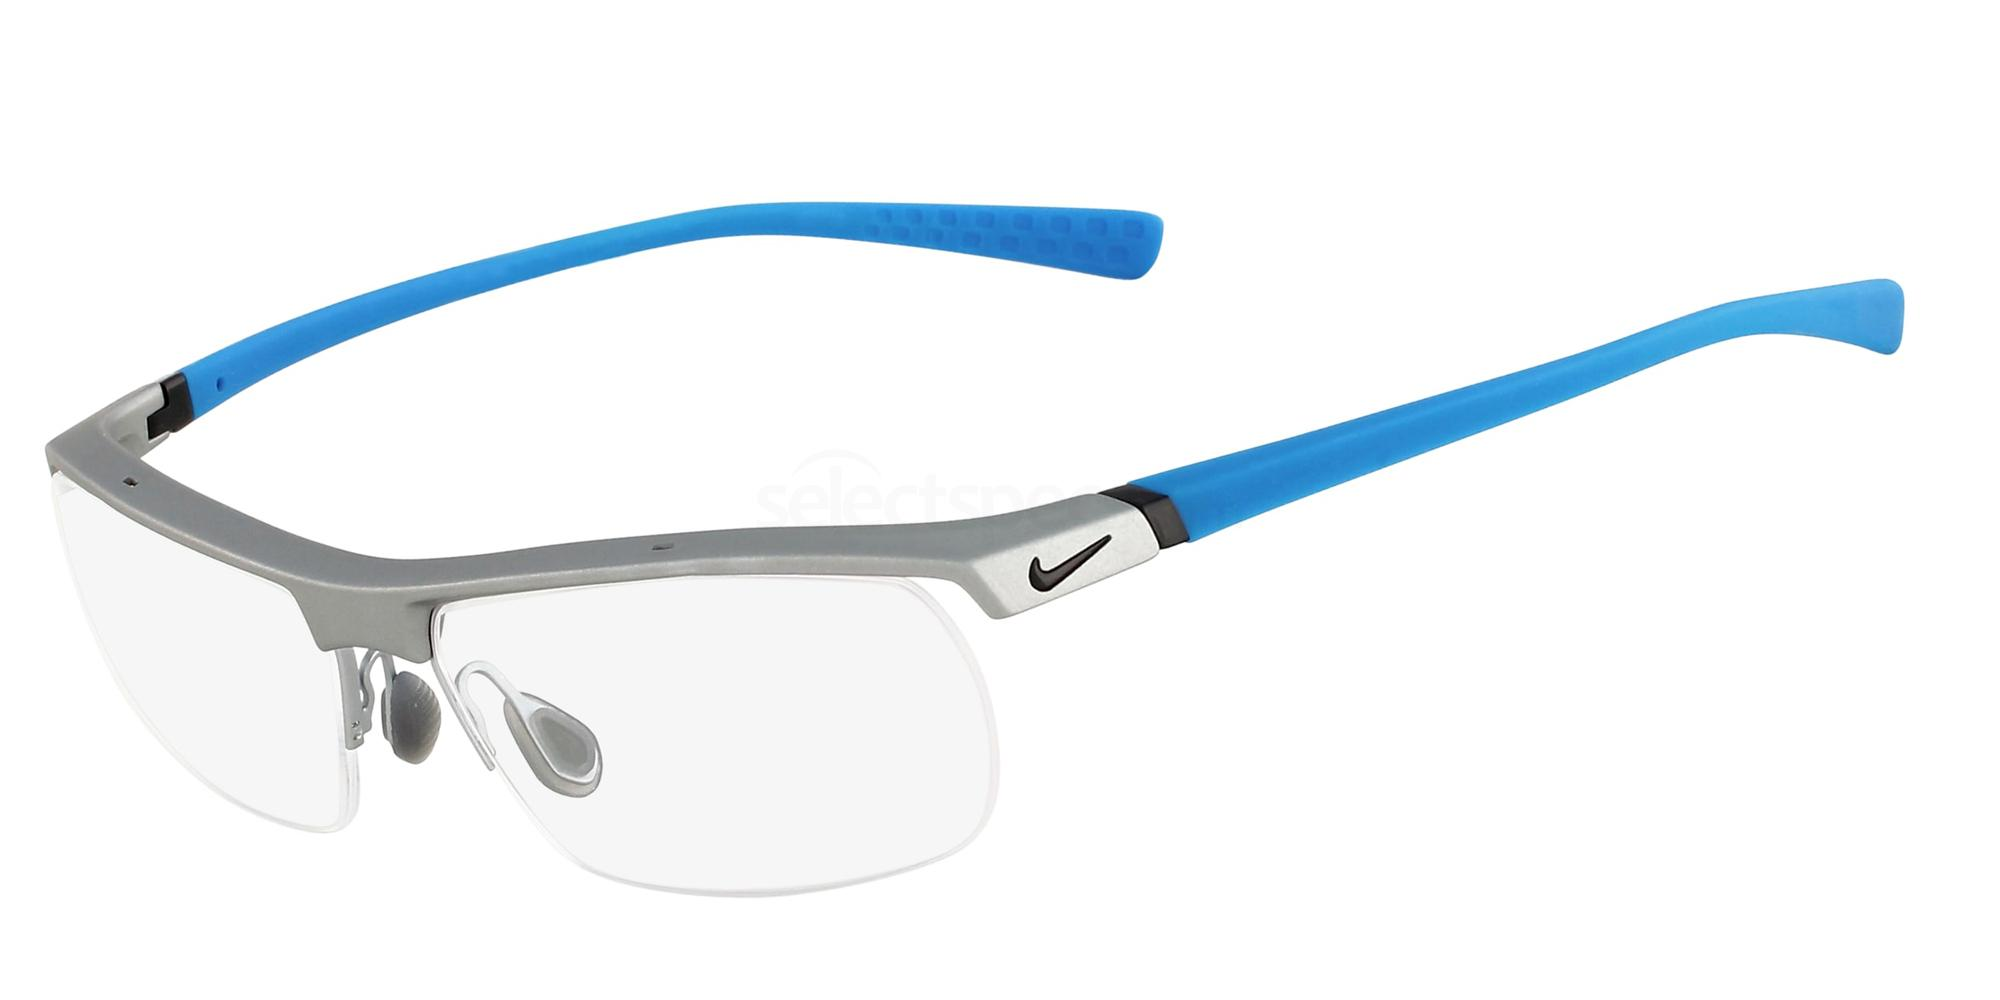 7071/2 080 7071/2 (Sports Eyewear) Glasses, Nike